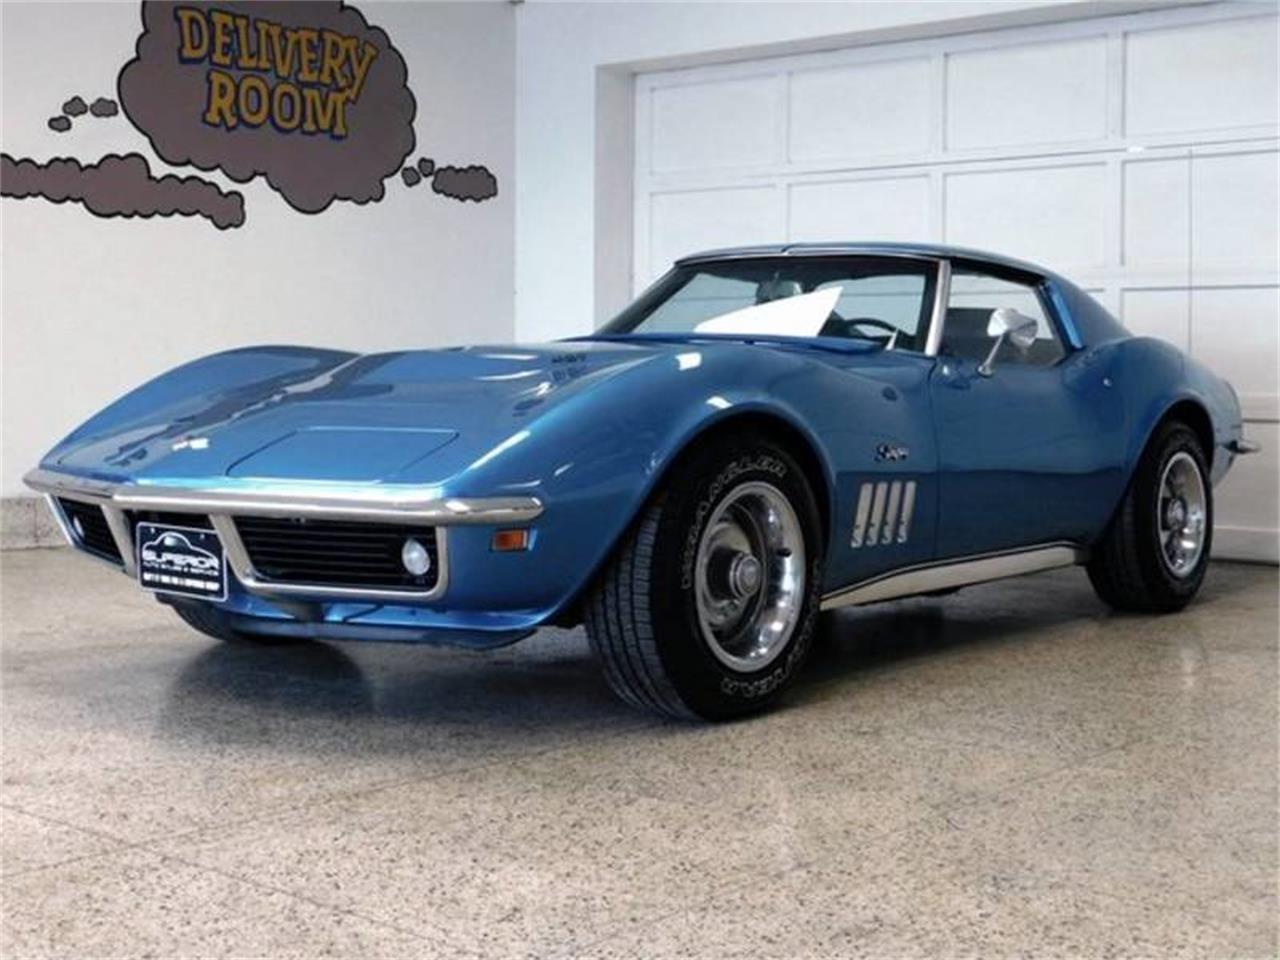 Kekurangan Chevrolet Corvette 1969 Spesifikasi